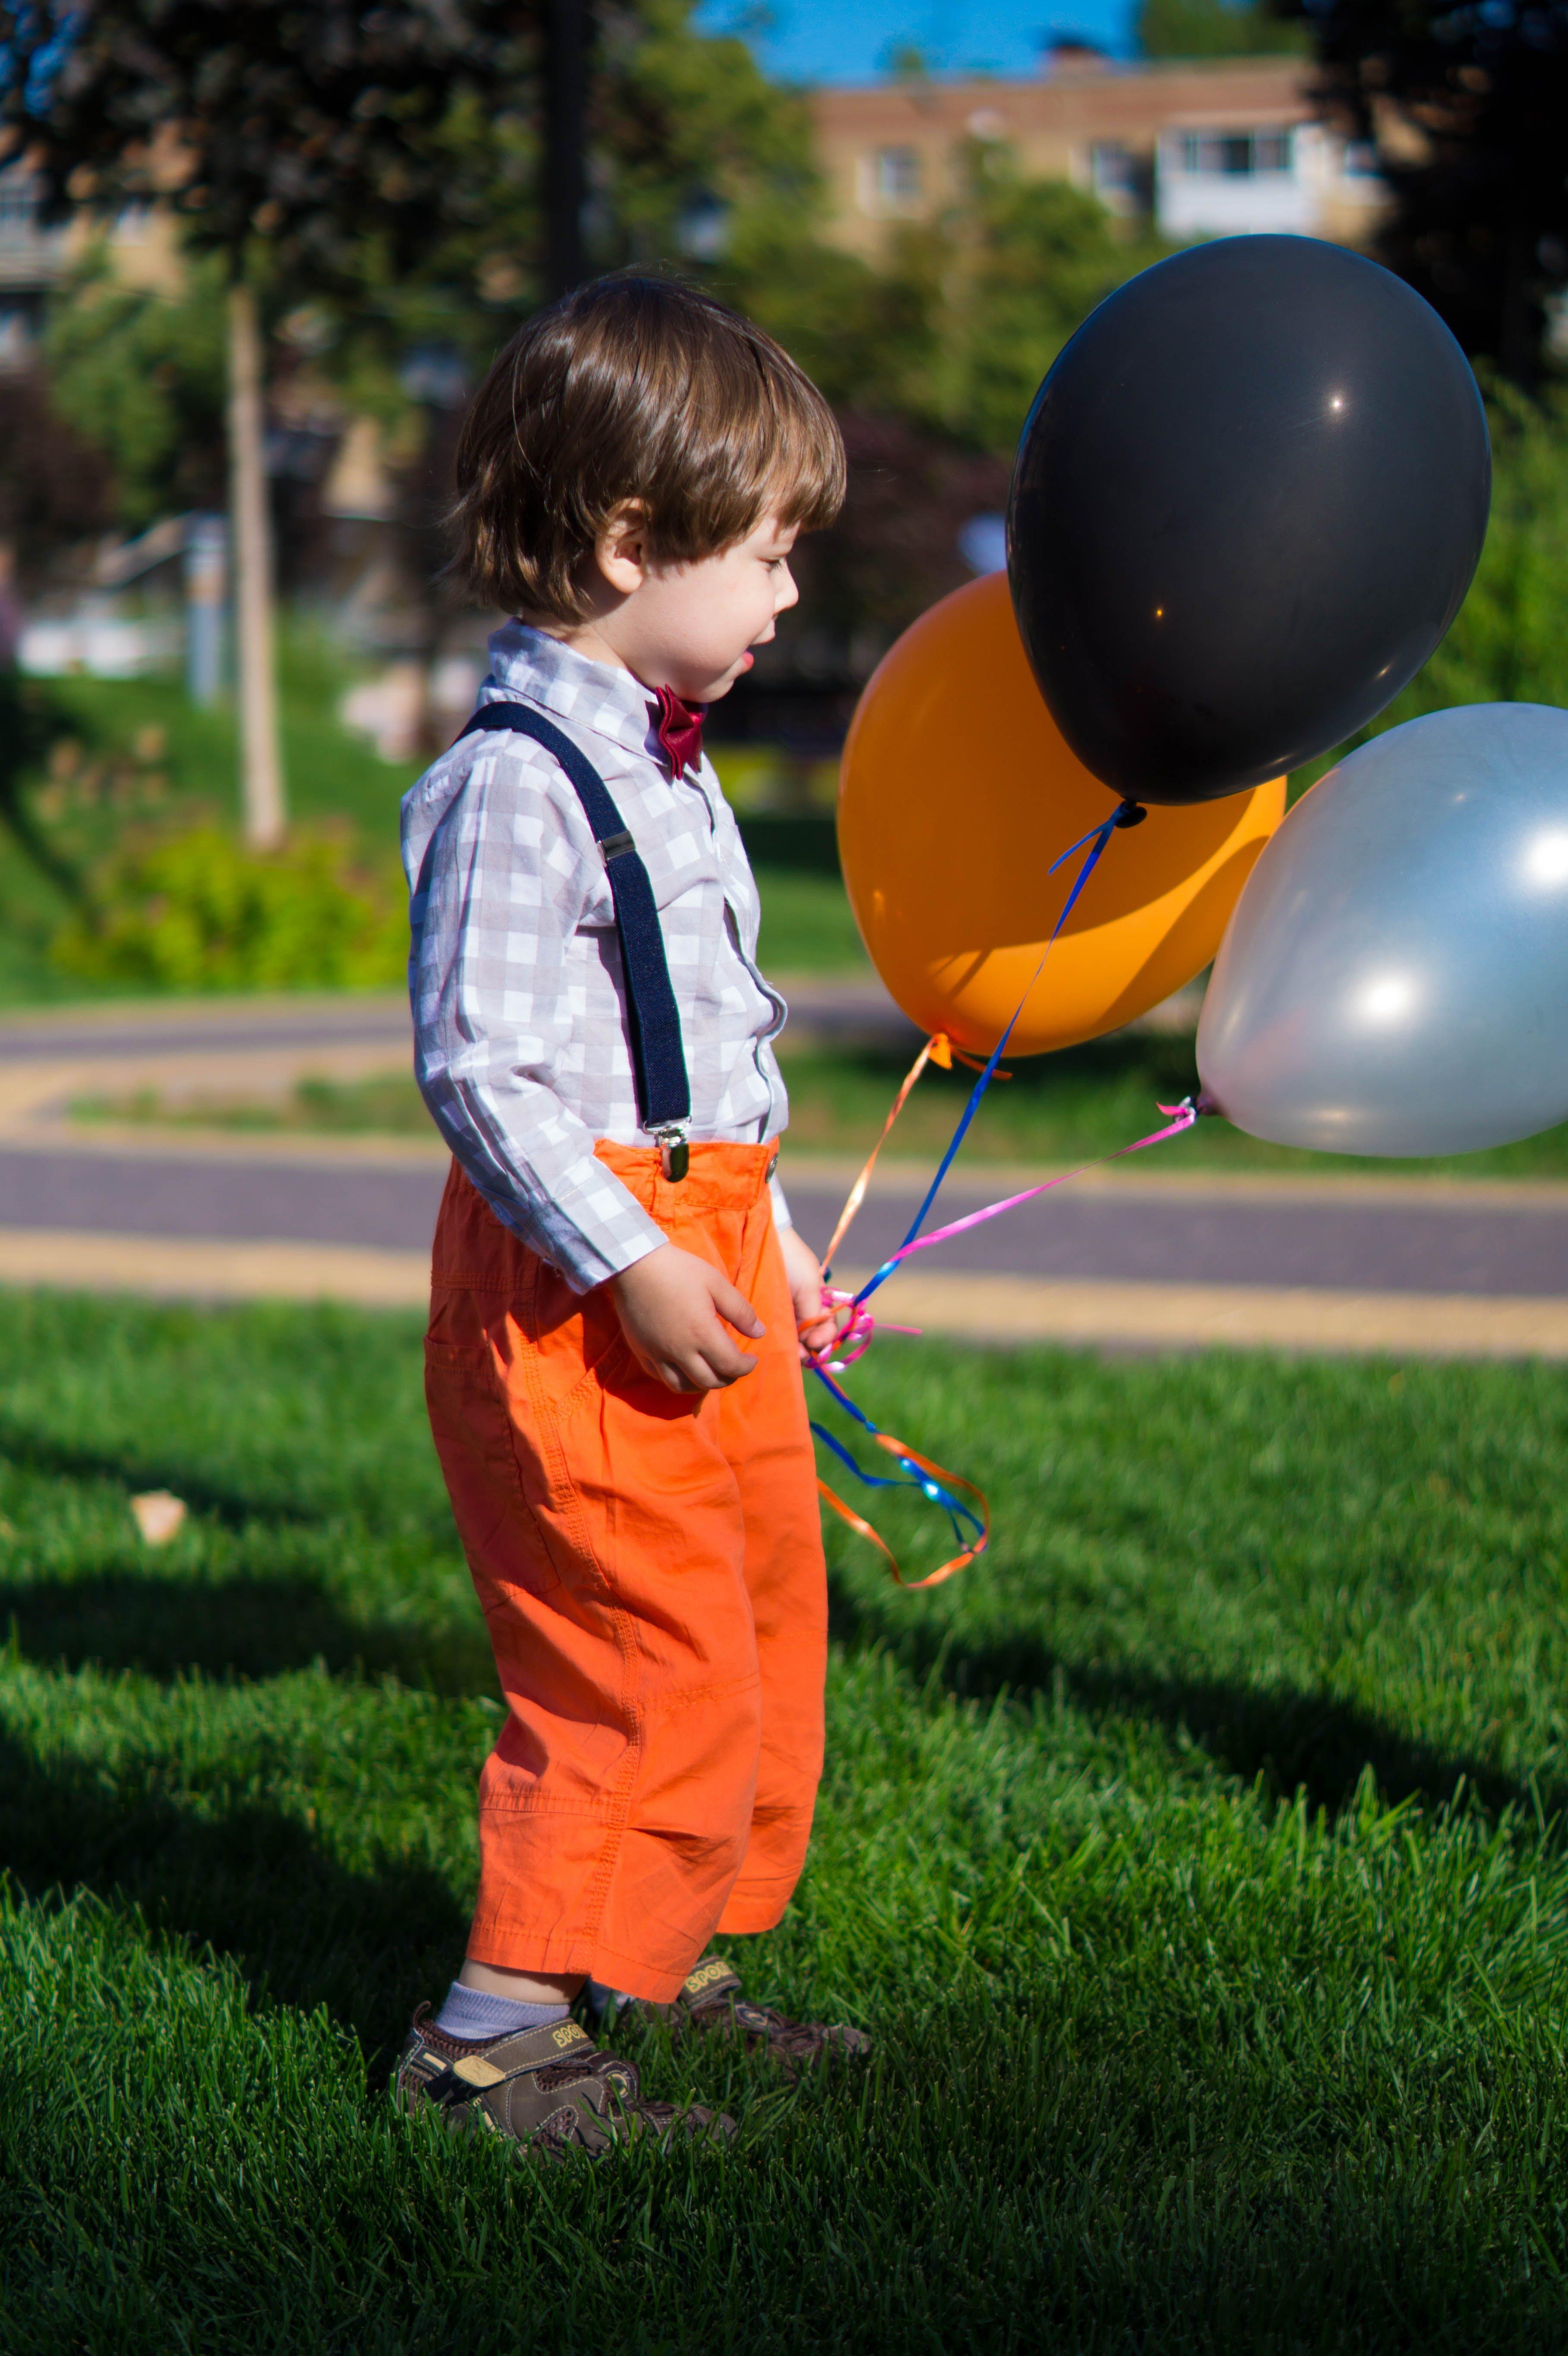 Boy Holding Three Balloons